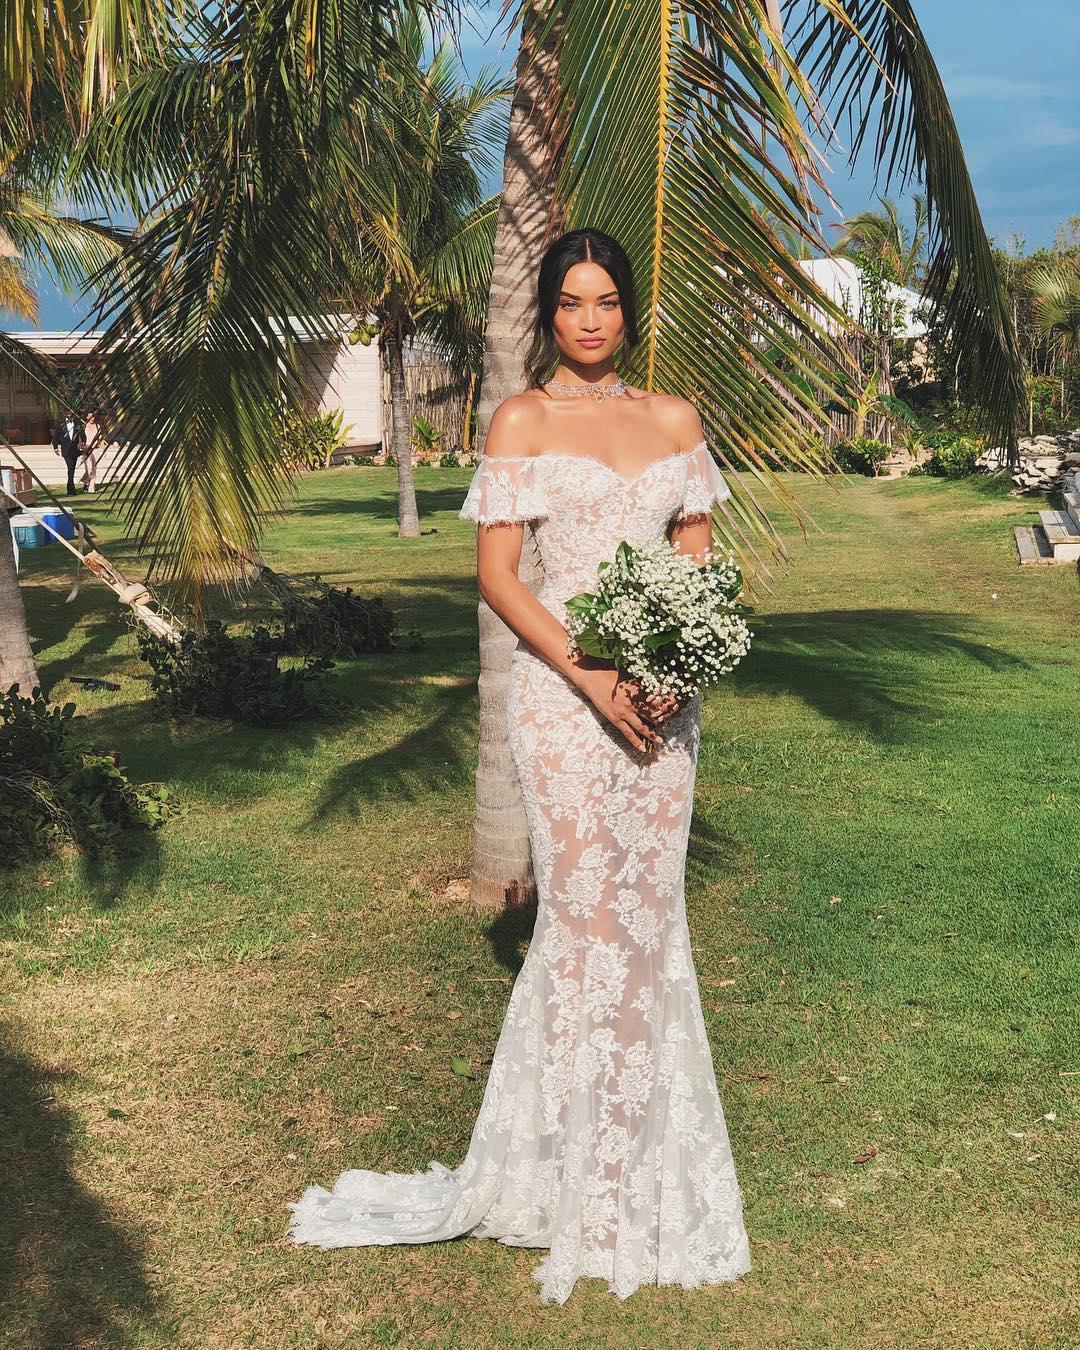 Svadba slávnych II - Modelka Shanina Shaik